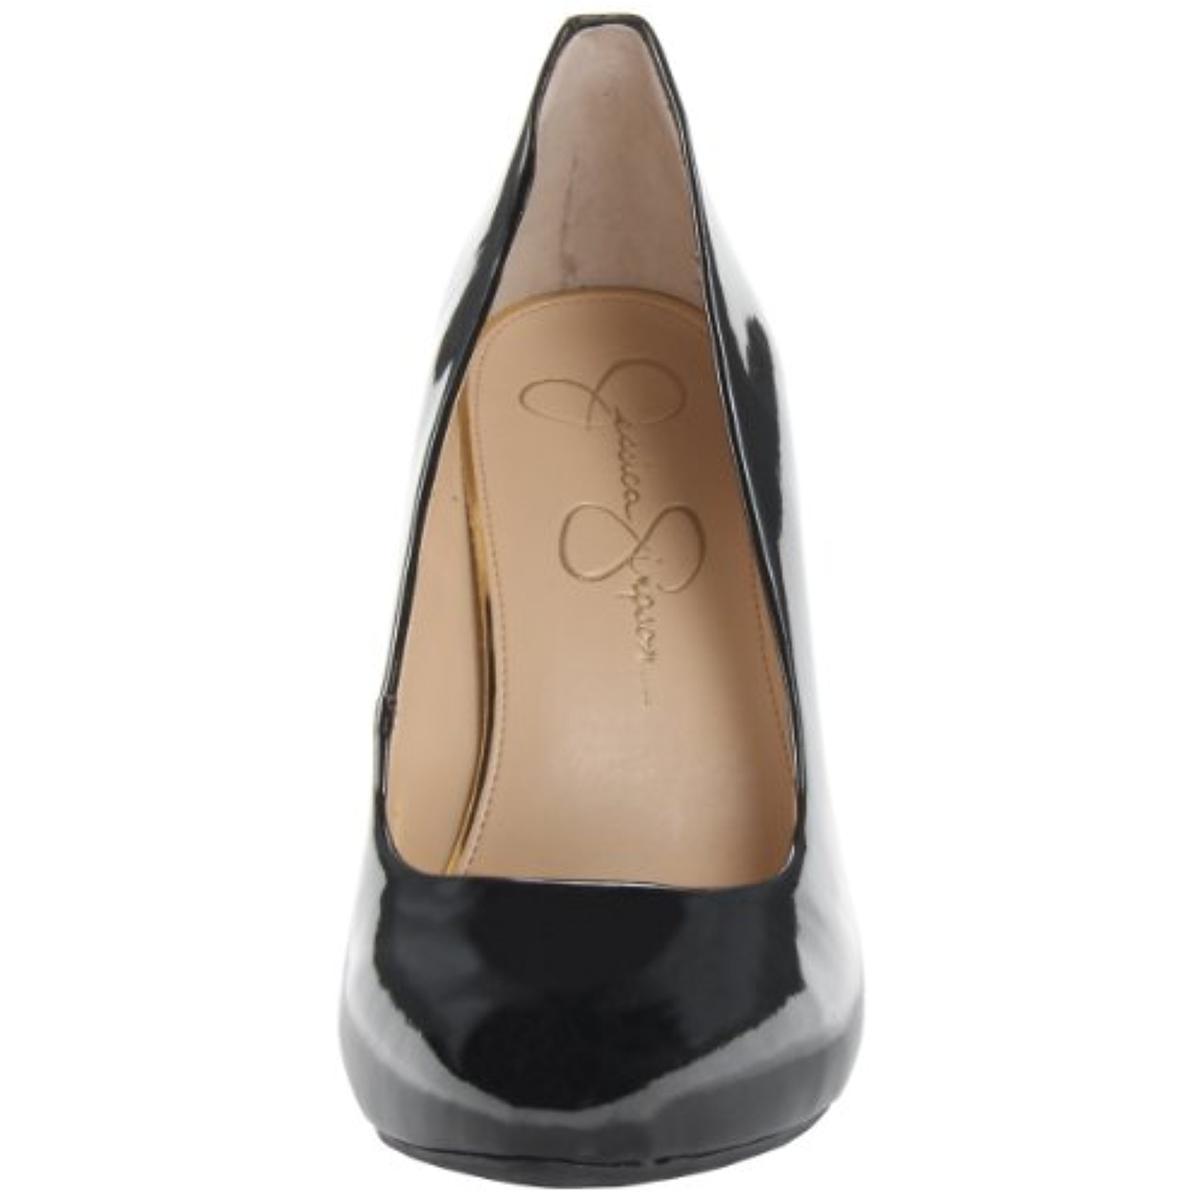 Jessica-Simpson-Malia-Women-039-s-Closed-Toe-Dress-Heels-Shoes thumbnail 6